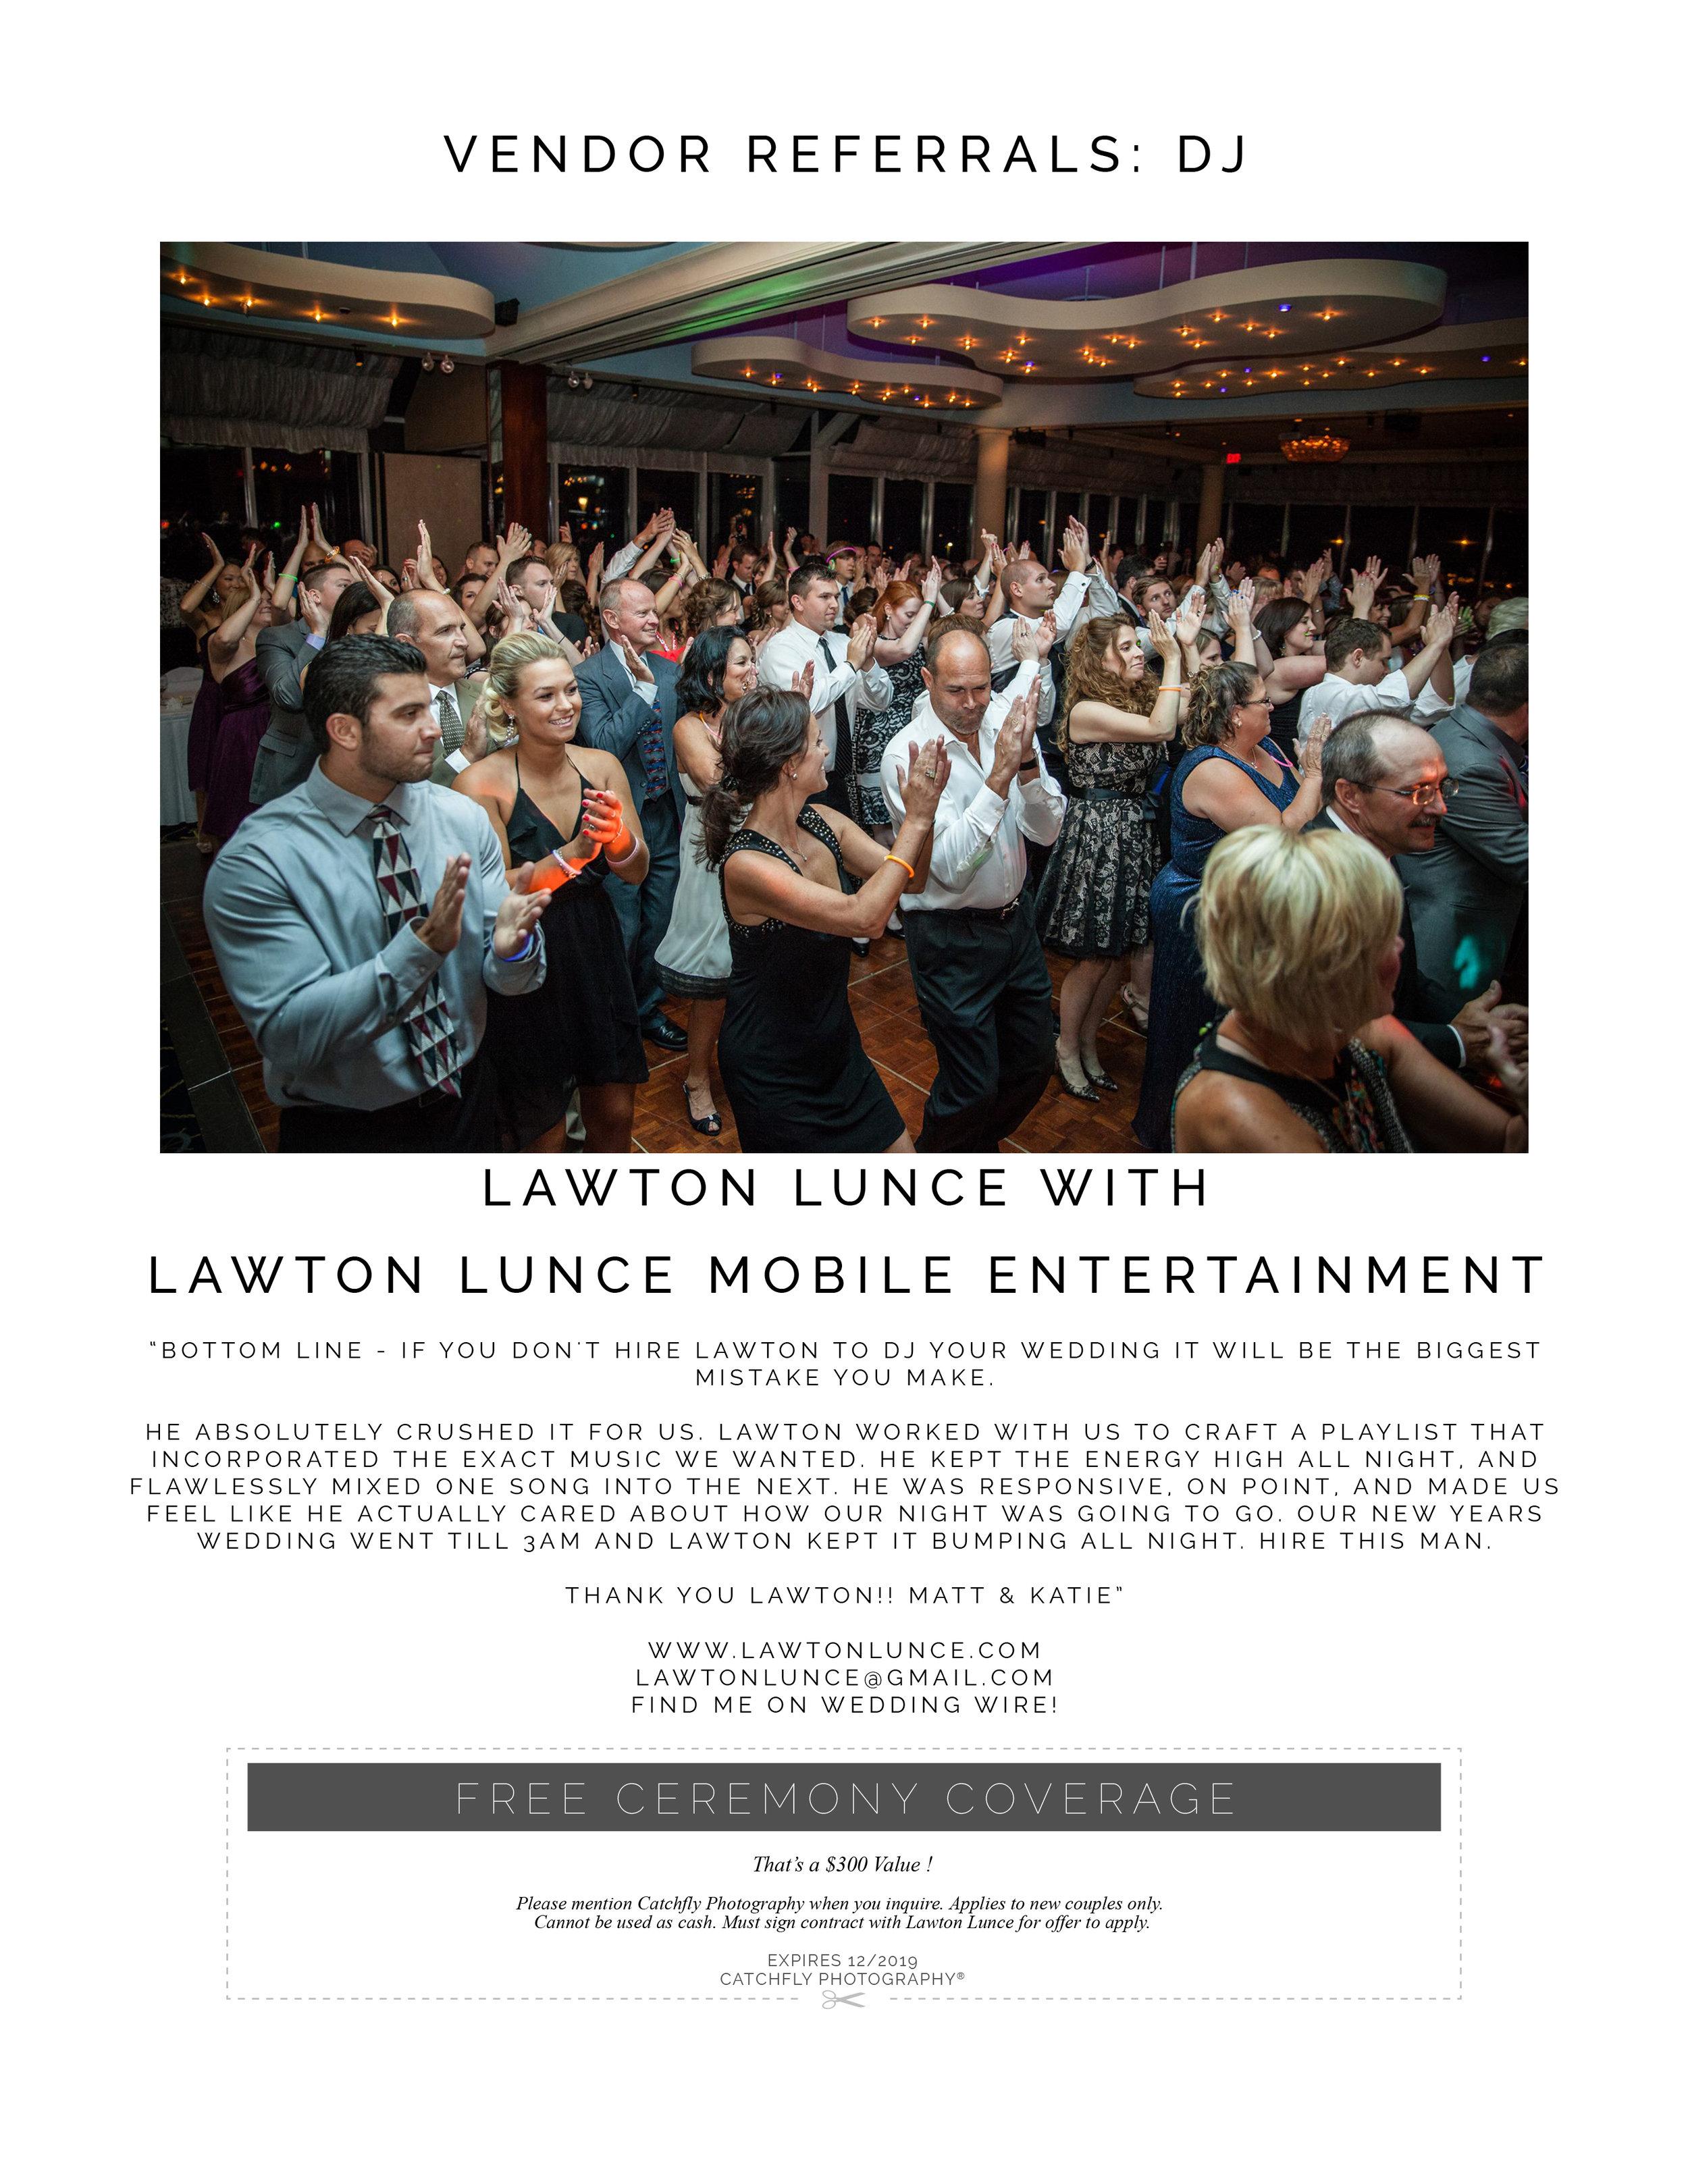 Lawton Lunce Mobile Entertainment Catchfly Photography Vendor Referral